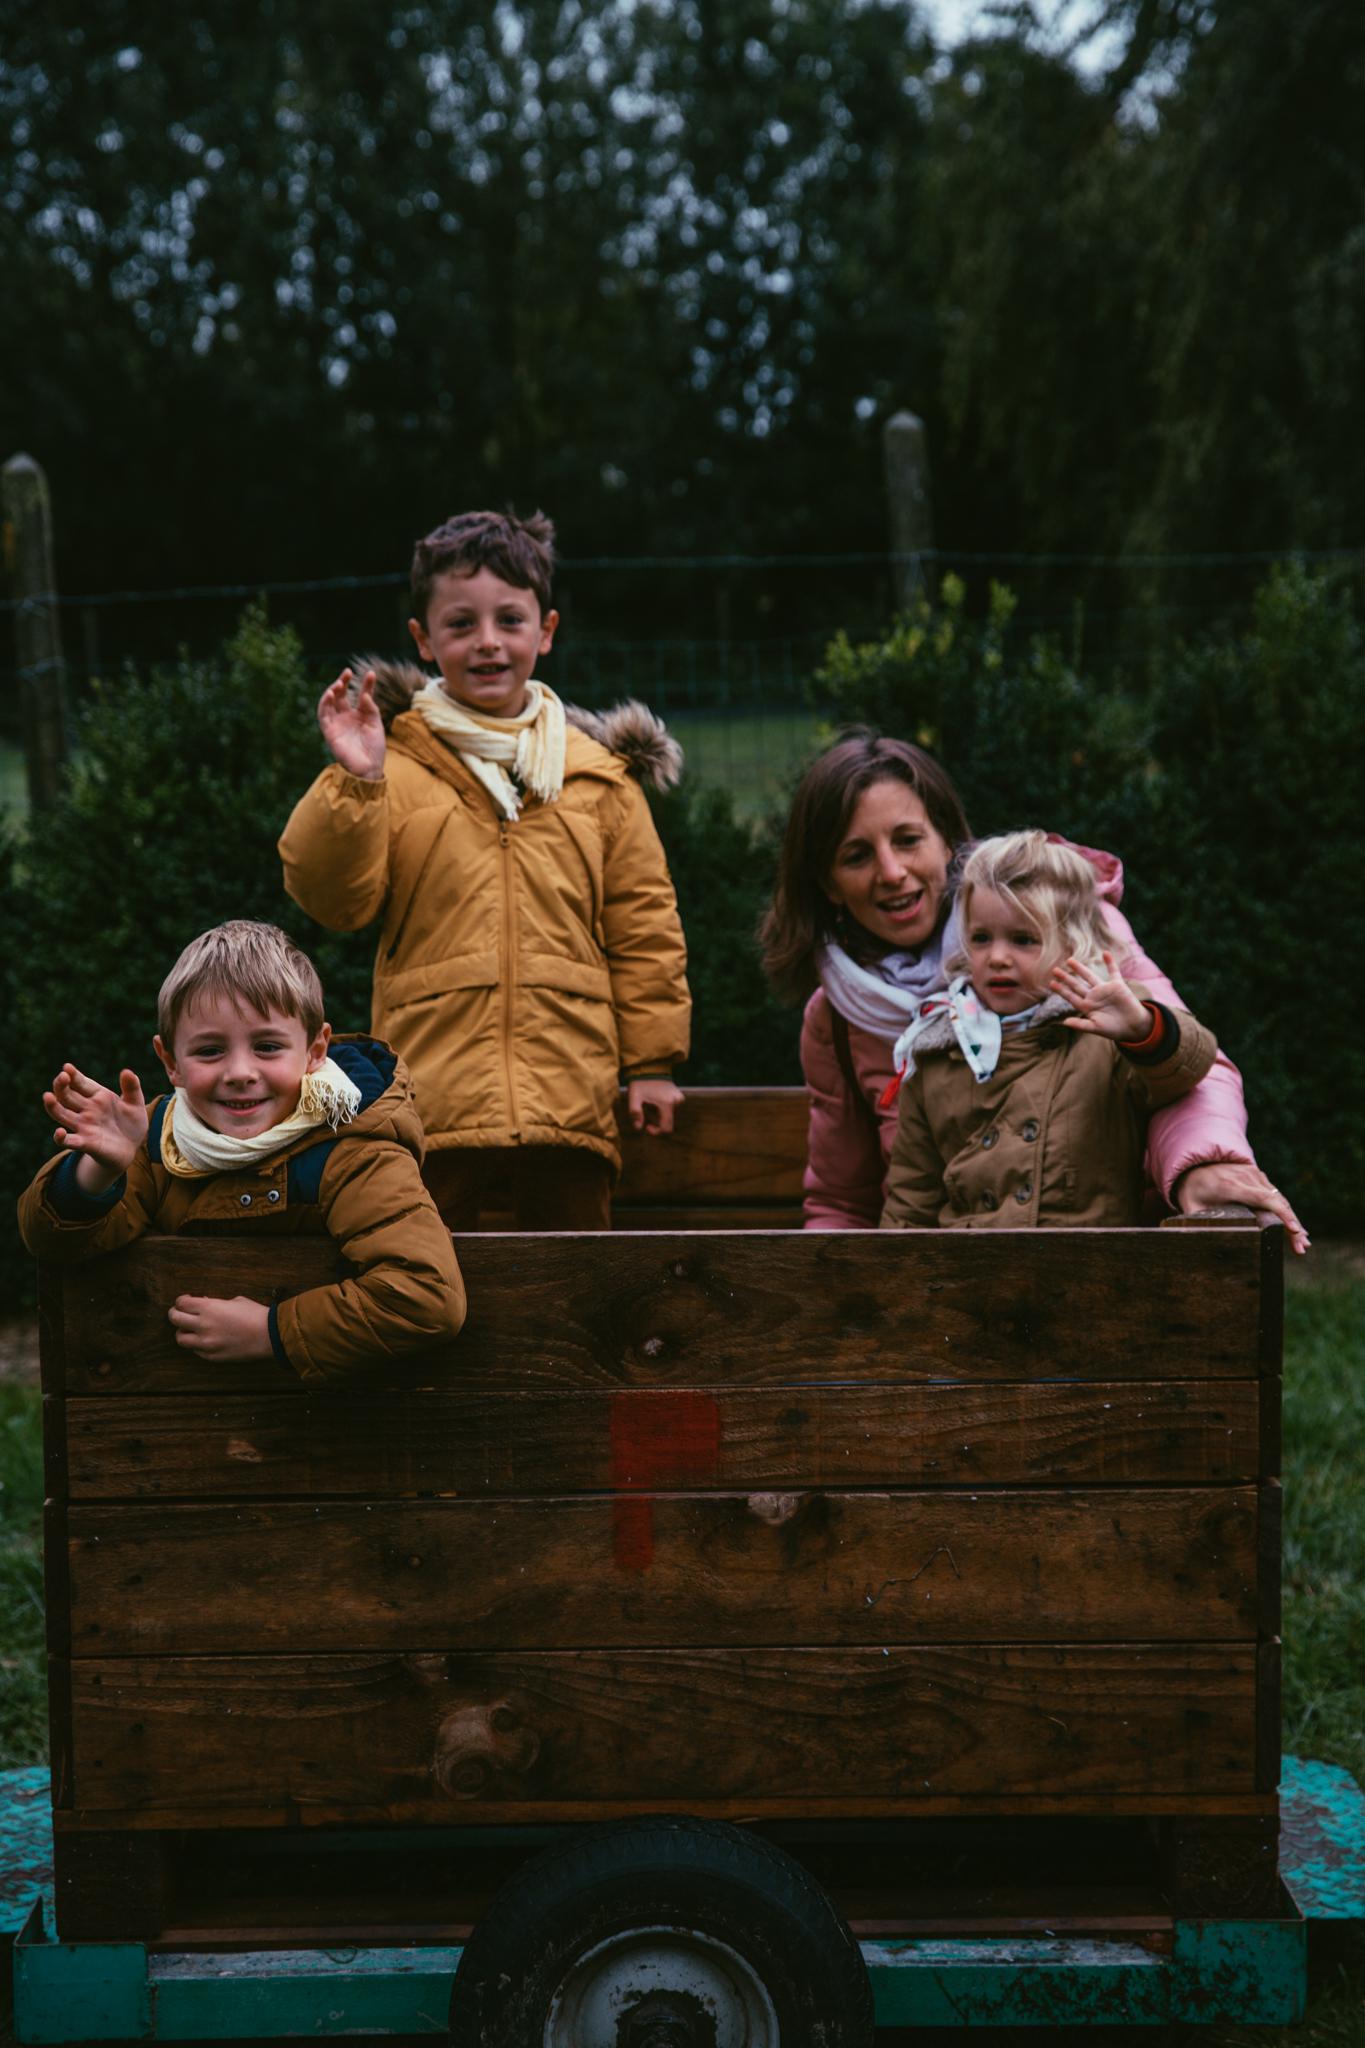 fruithoeve picard ardennes flamandes en famille